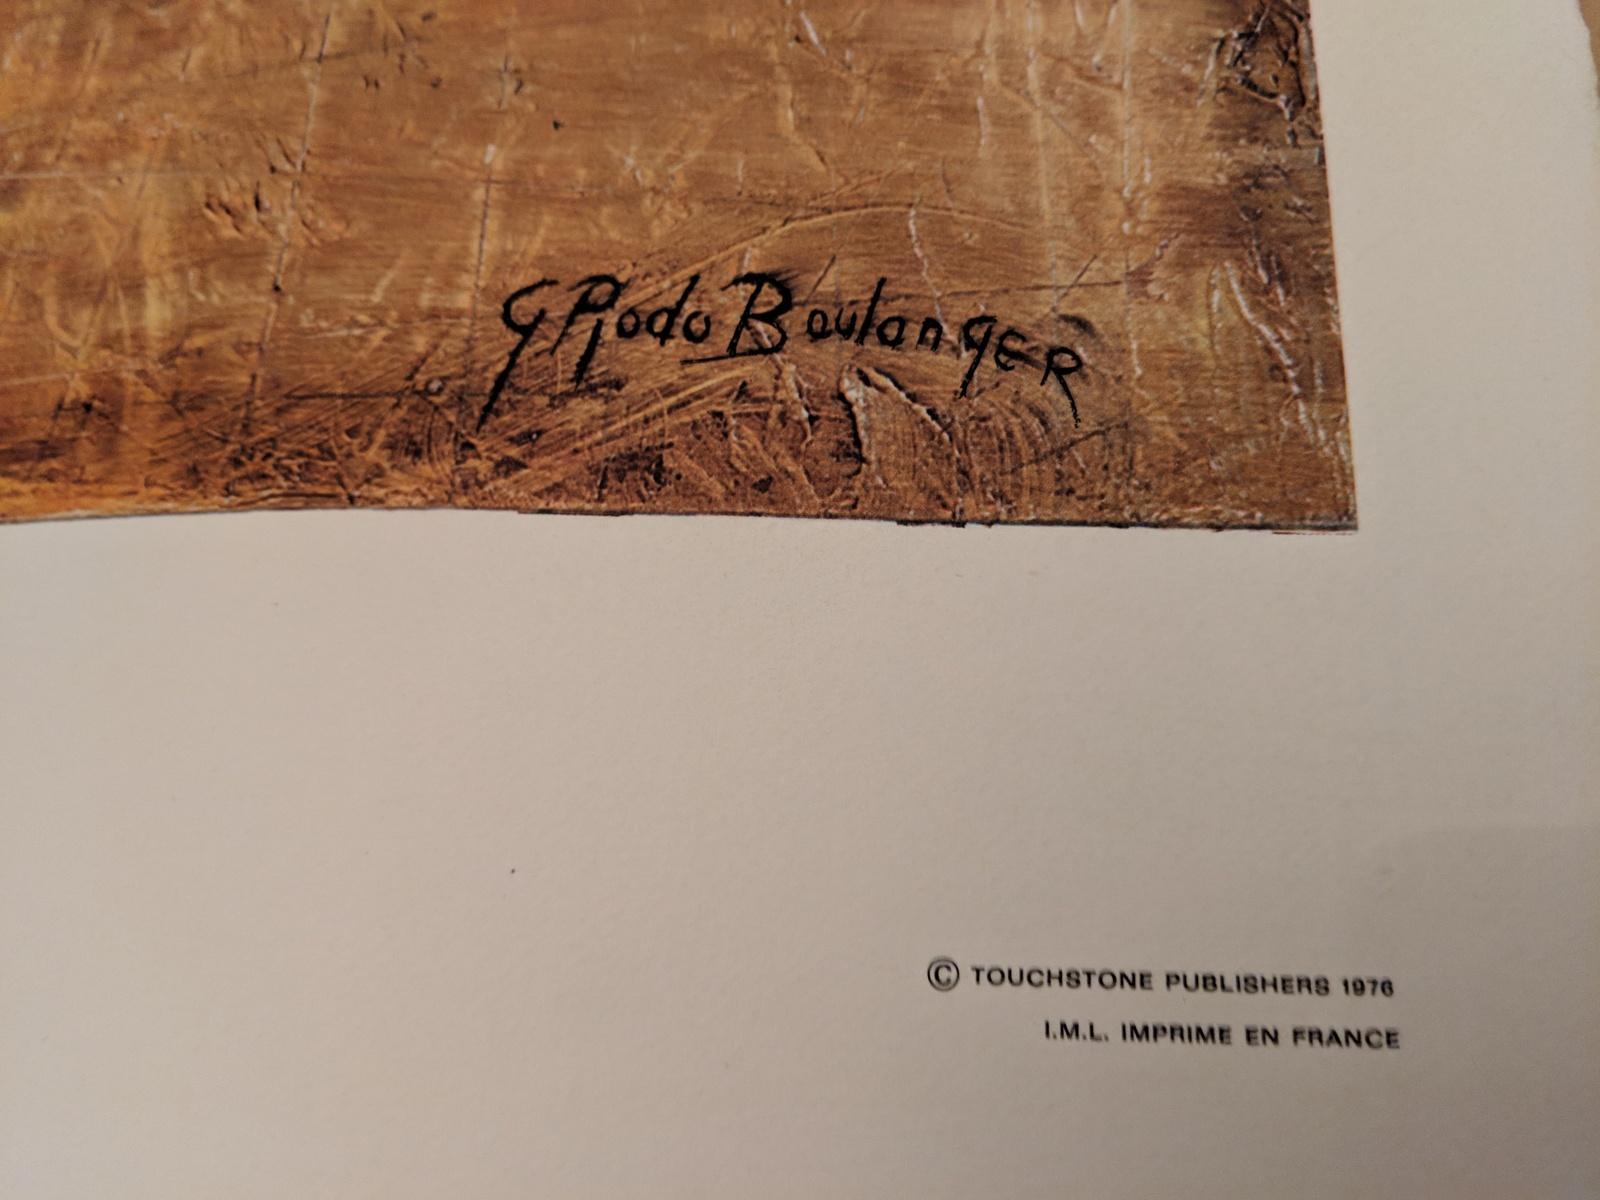 Graciela Rodo Boulanger 1976 Tour de France Art Print, Vintage, Like New